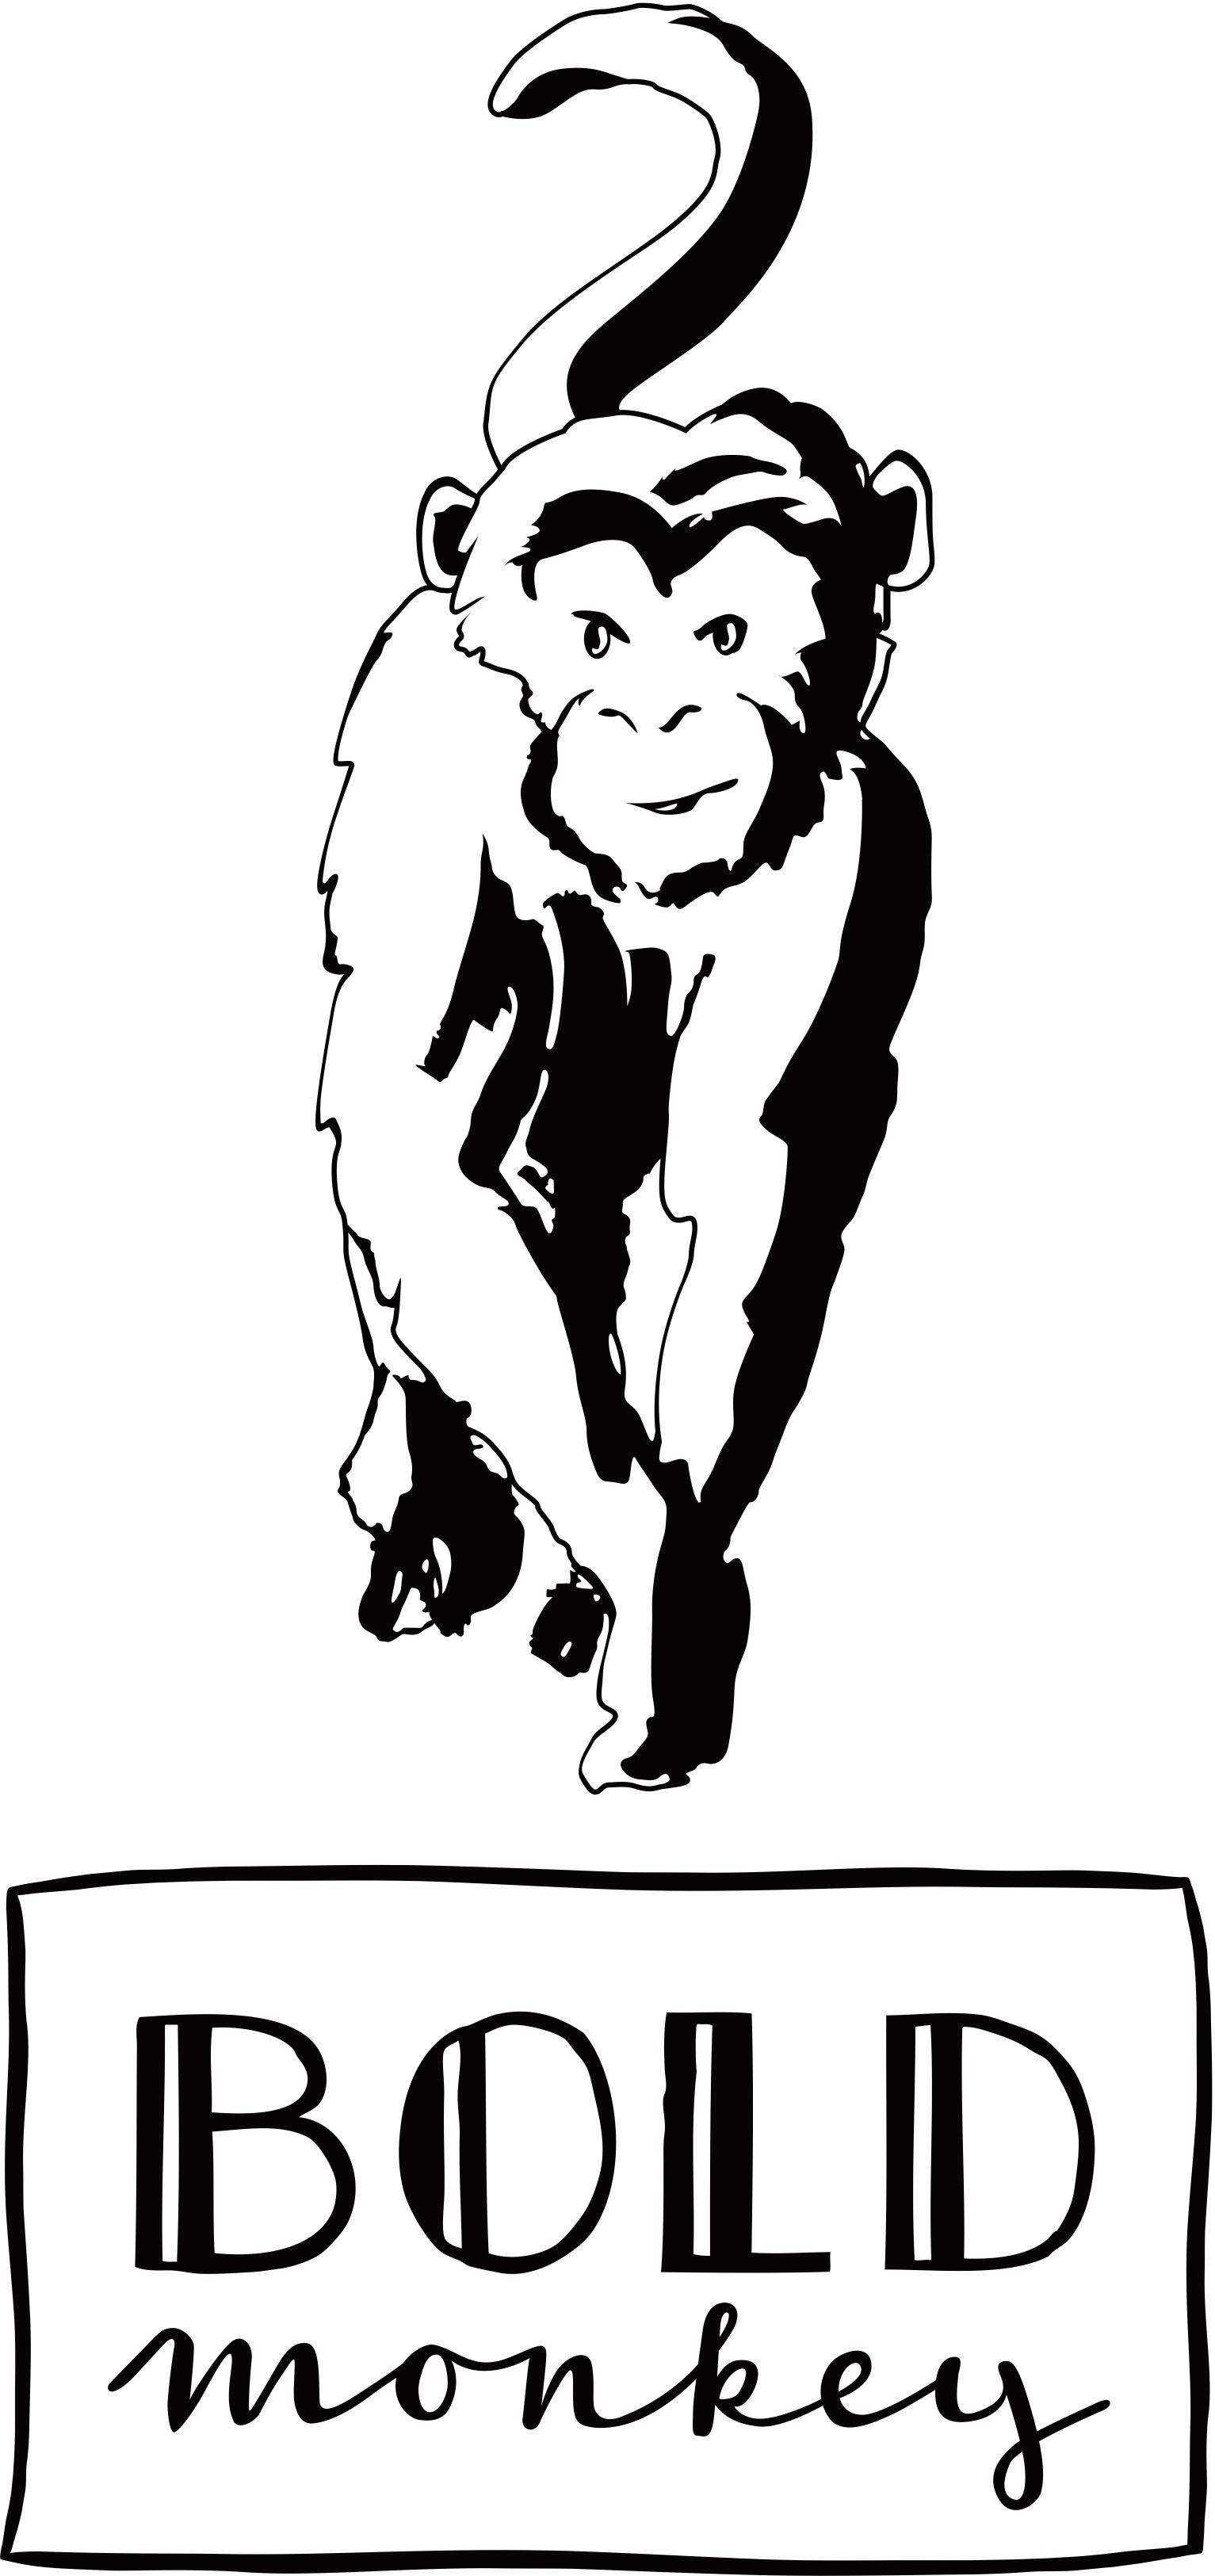 Bold Monkey princesses have feelings too armstoel vogels fauteuil wit zijaanzicht